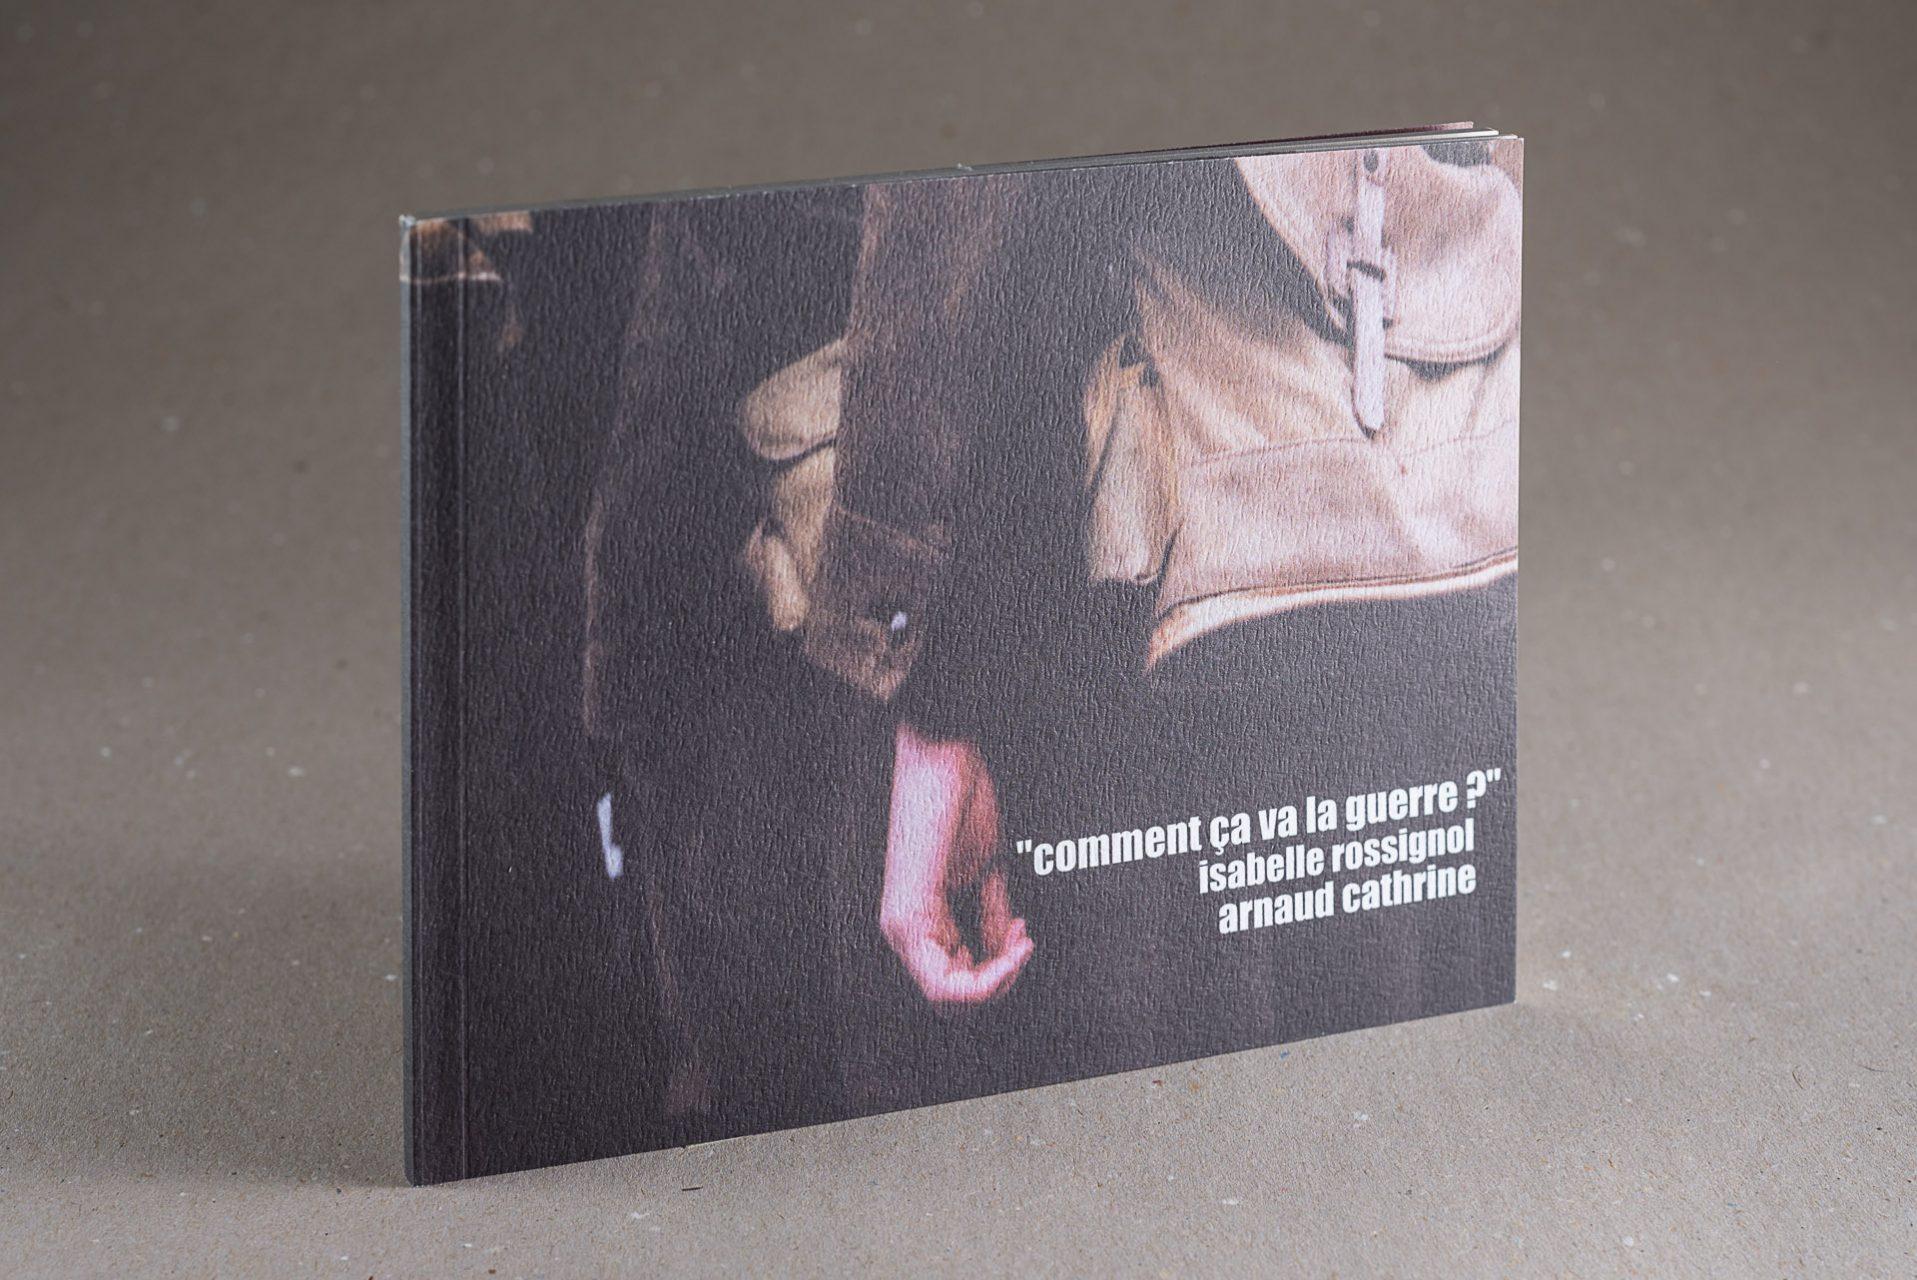 web-hd-nuit-myrtide-livre-comment-ca-va-la-guerre-rossignol-cathrine-01